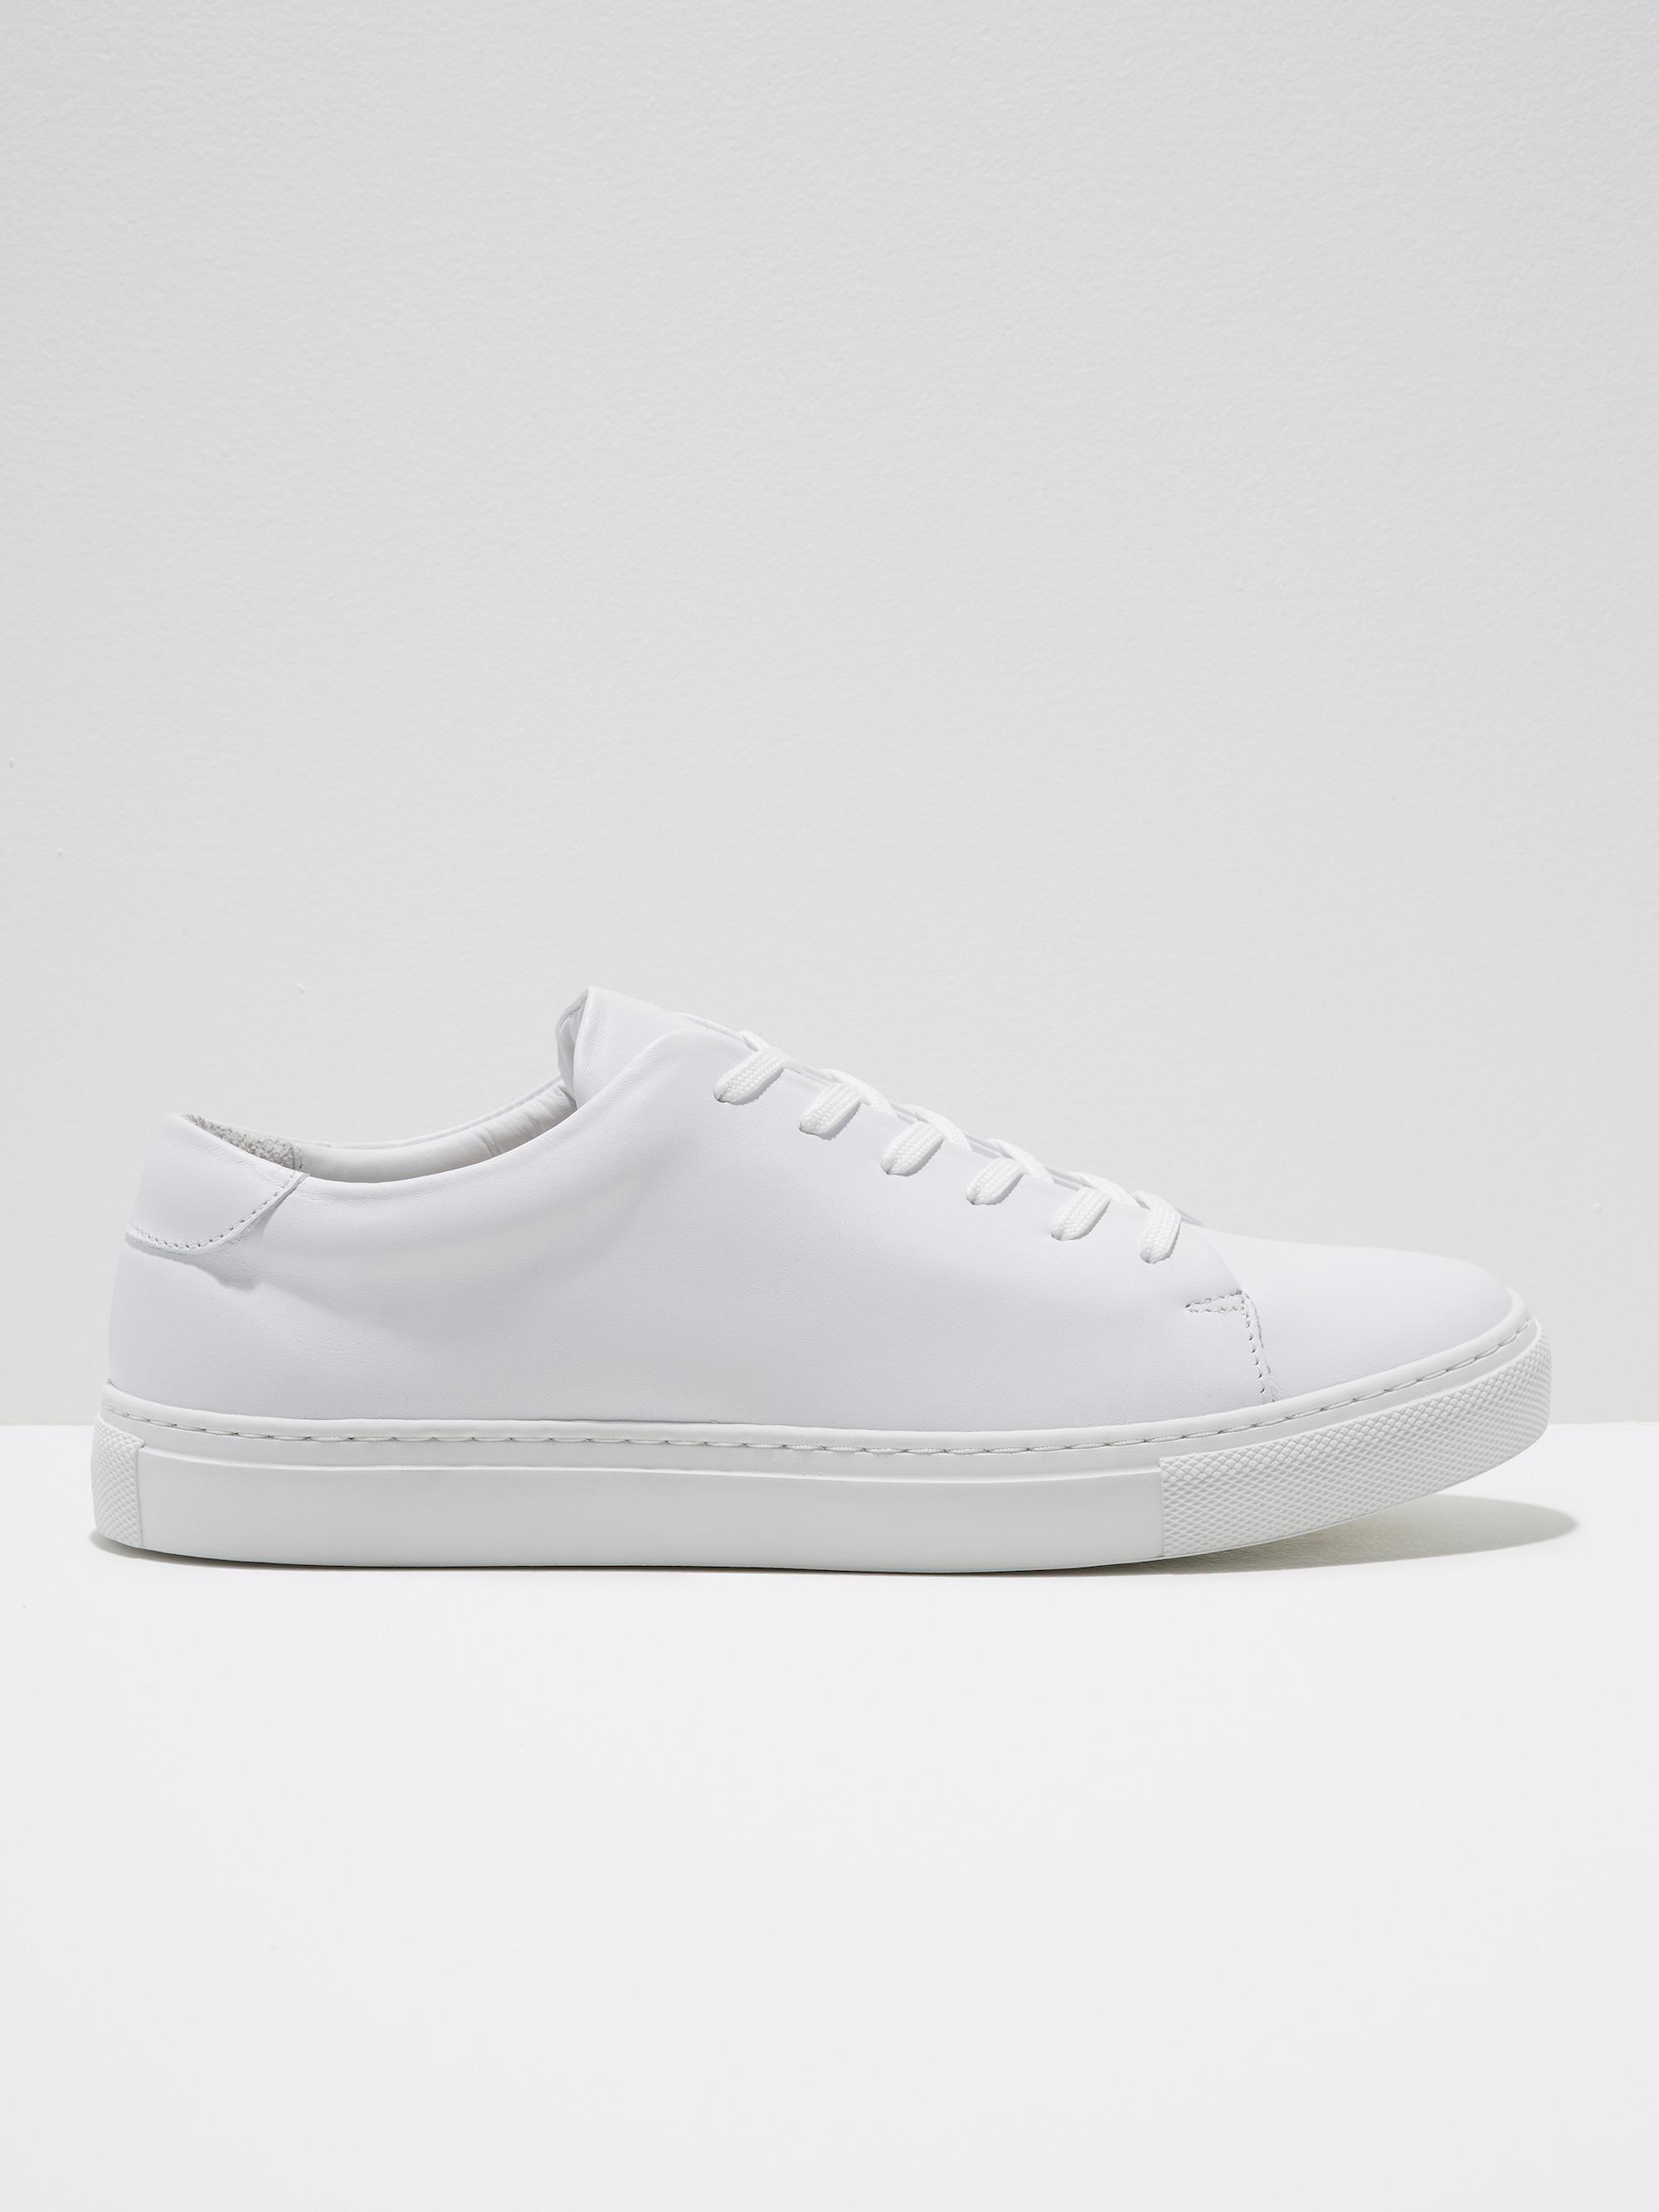 Oak Park Leather Low-top Sneakers